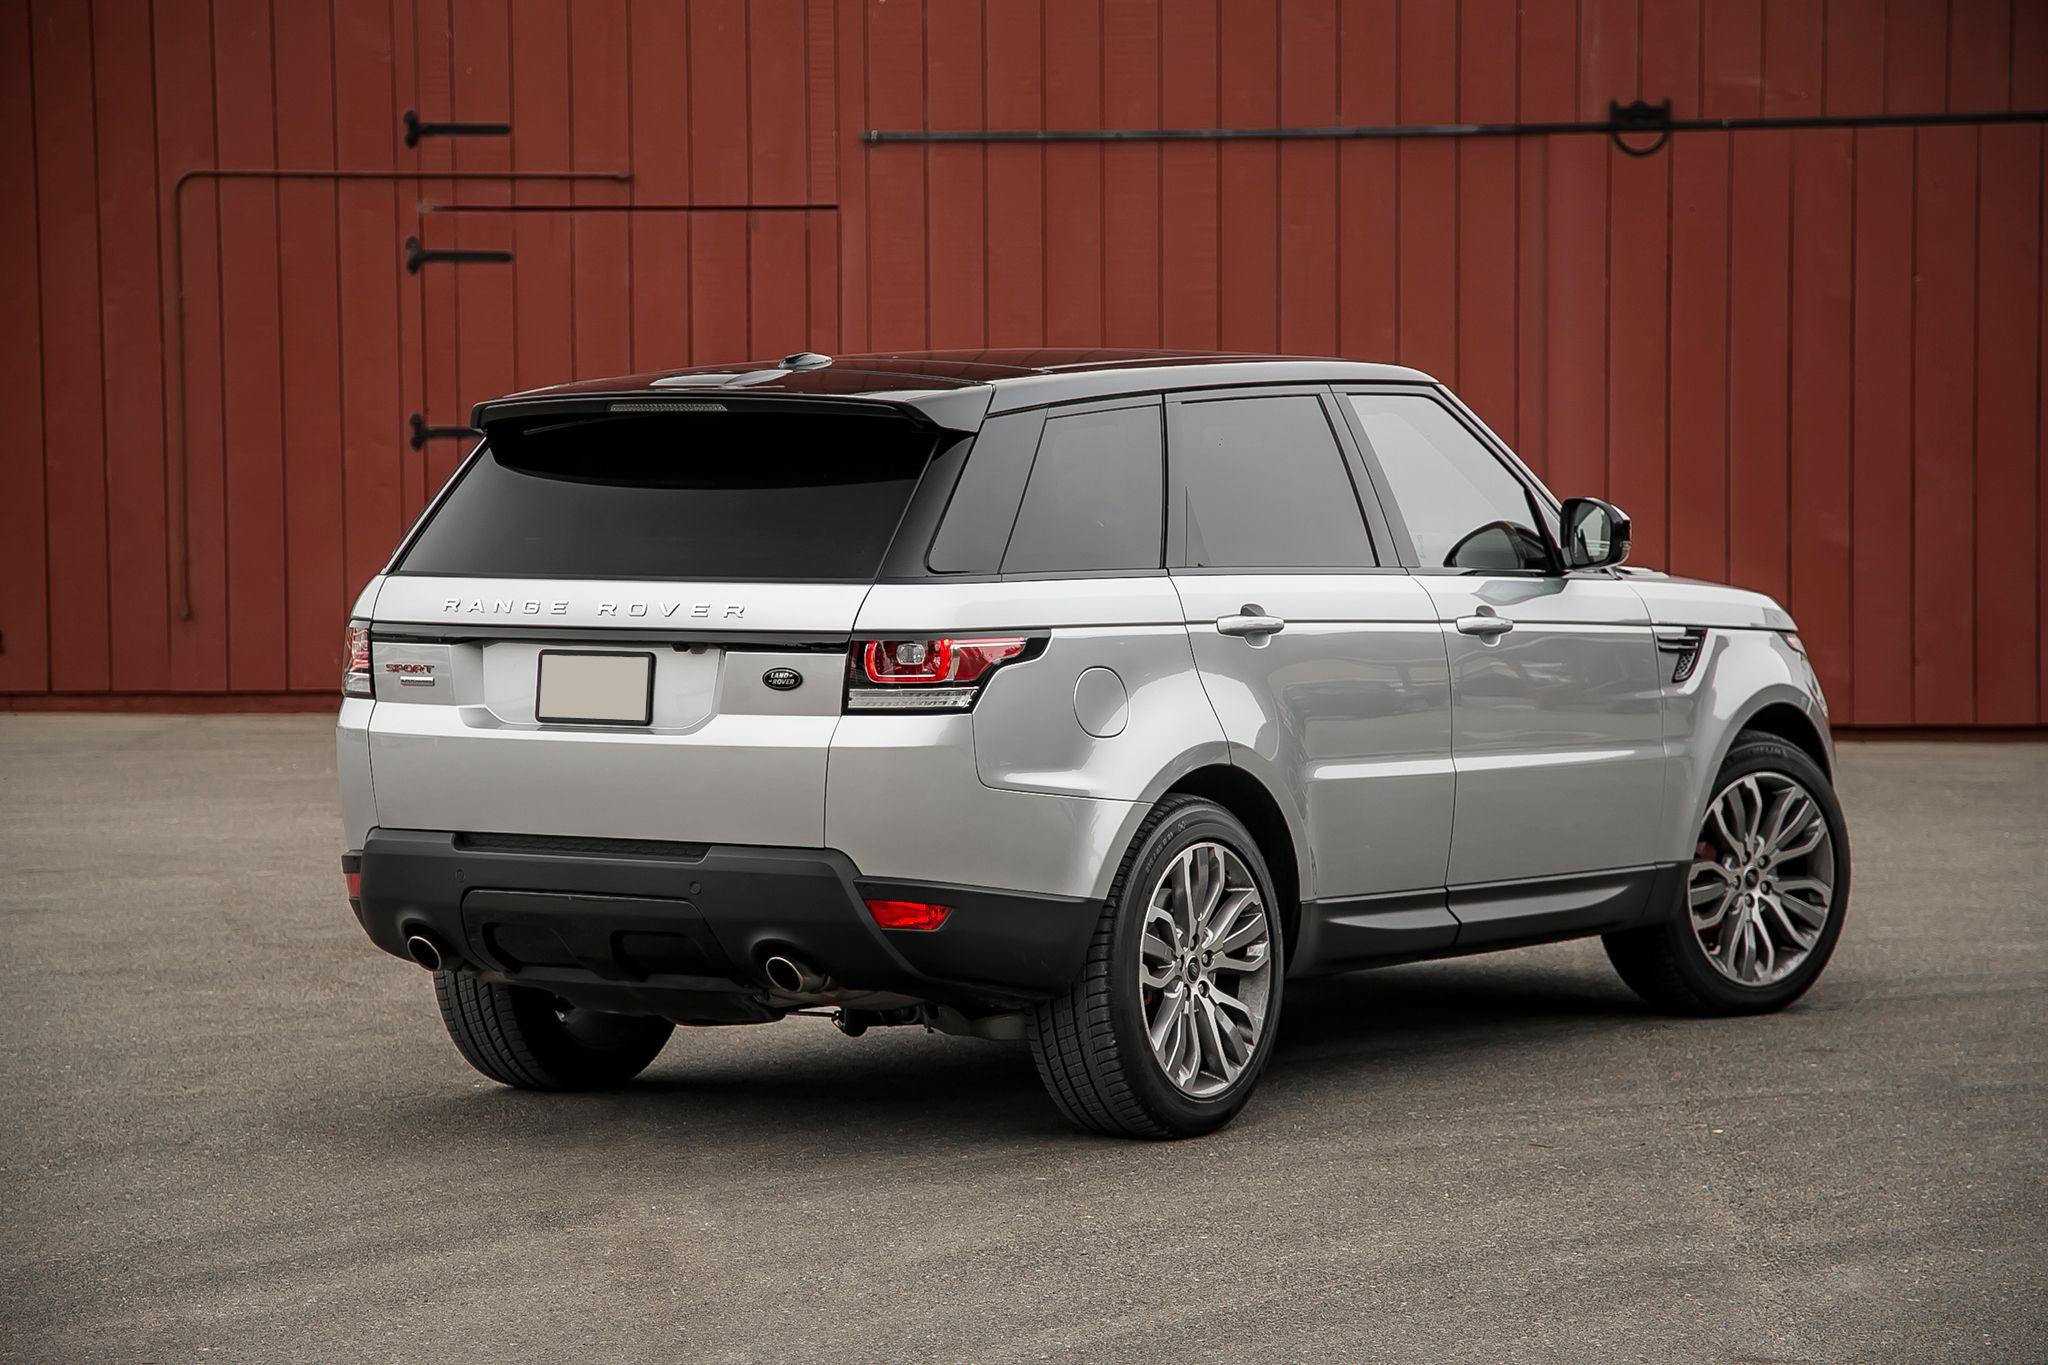 Reconditioned & Used Range Rover Sport E3 (L494) engine